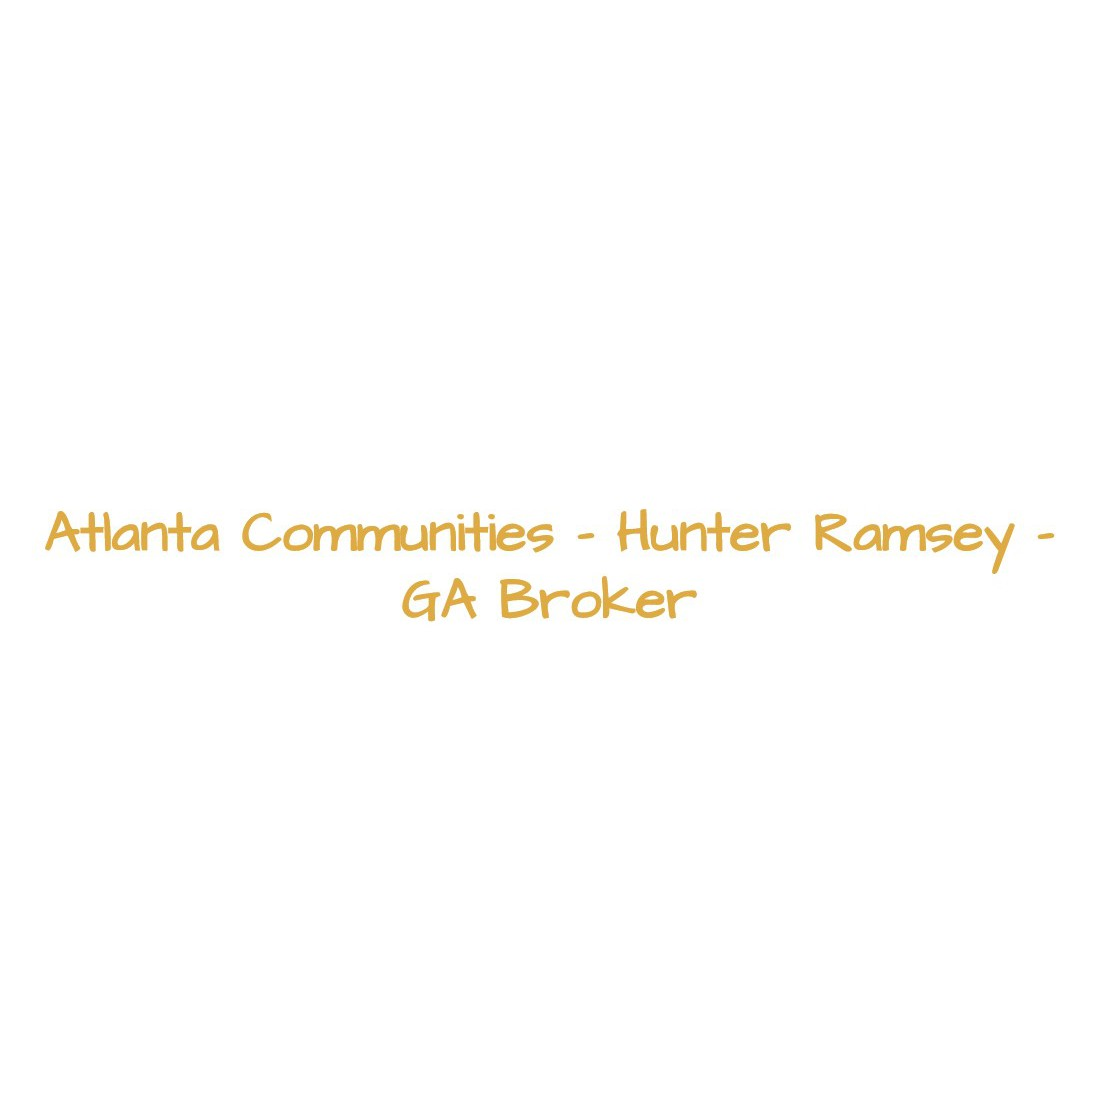 Hunter Ramsey - Realtor - Georgia Real Estate Broker - Woodstock, GA 30188 - (770)519-1897 | ShowMeLocal.com